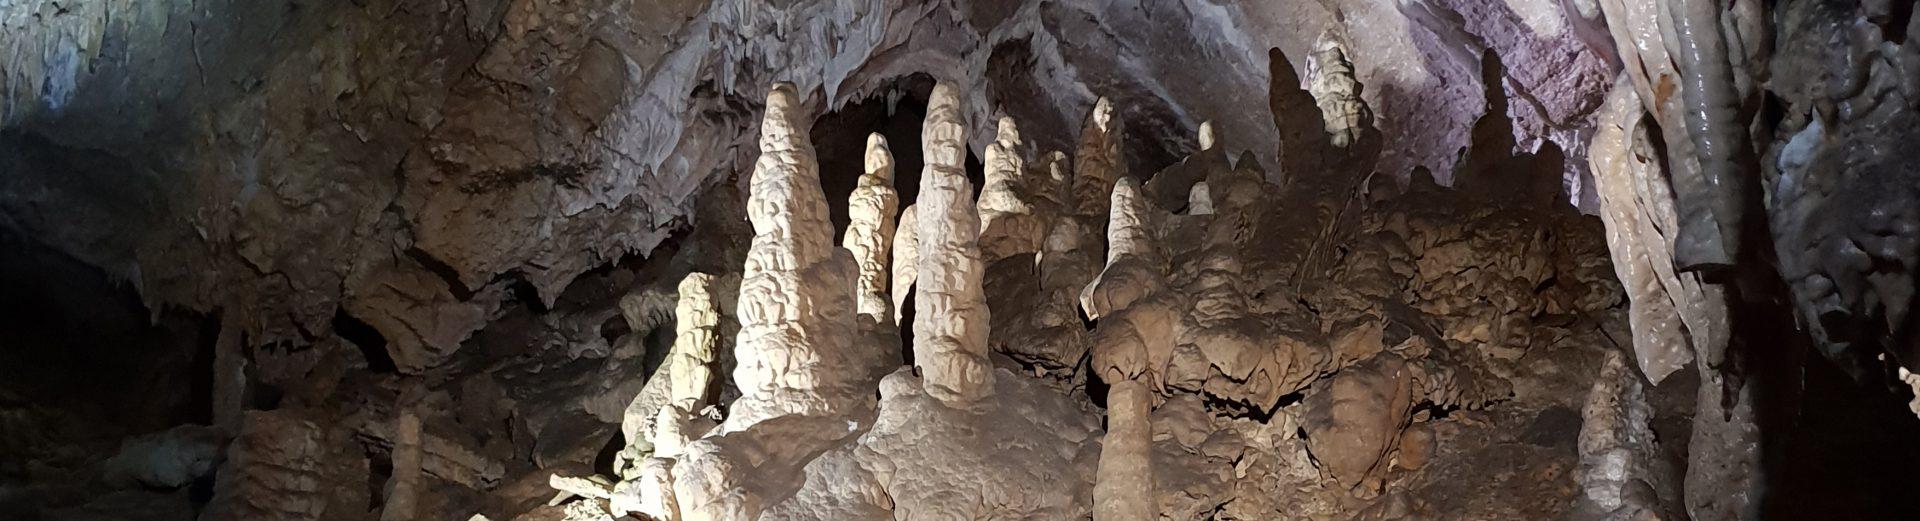 belianska jaskyna tatranska kotlina rozpravka